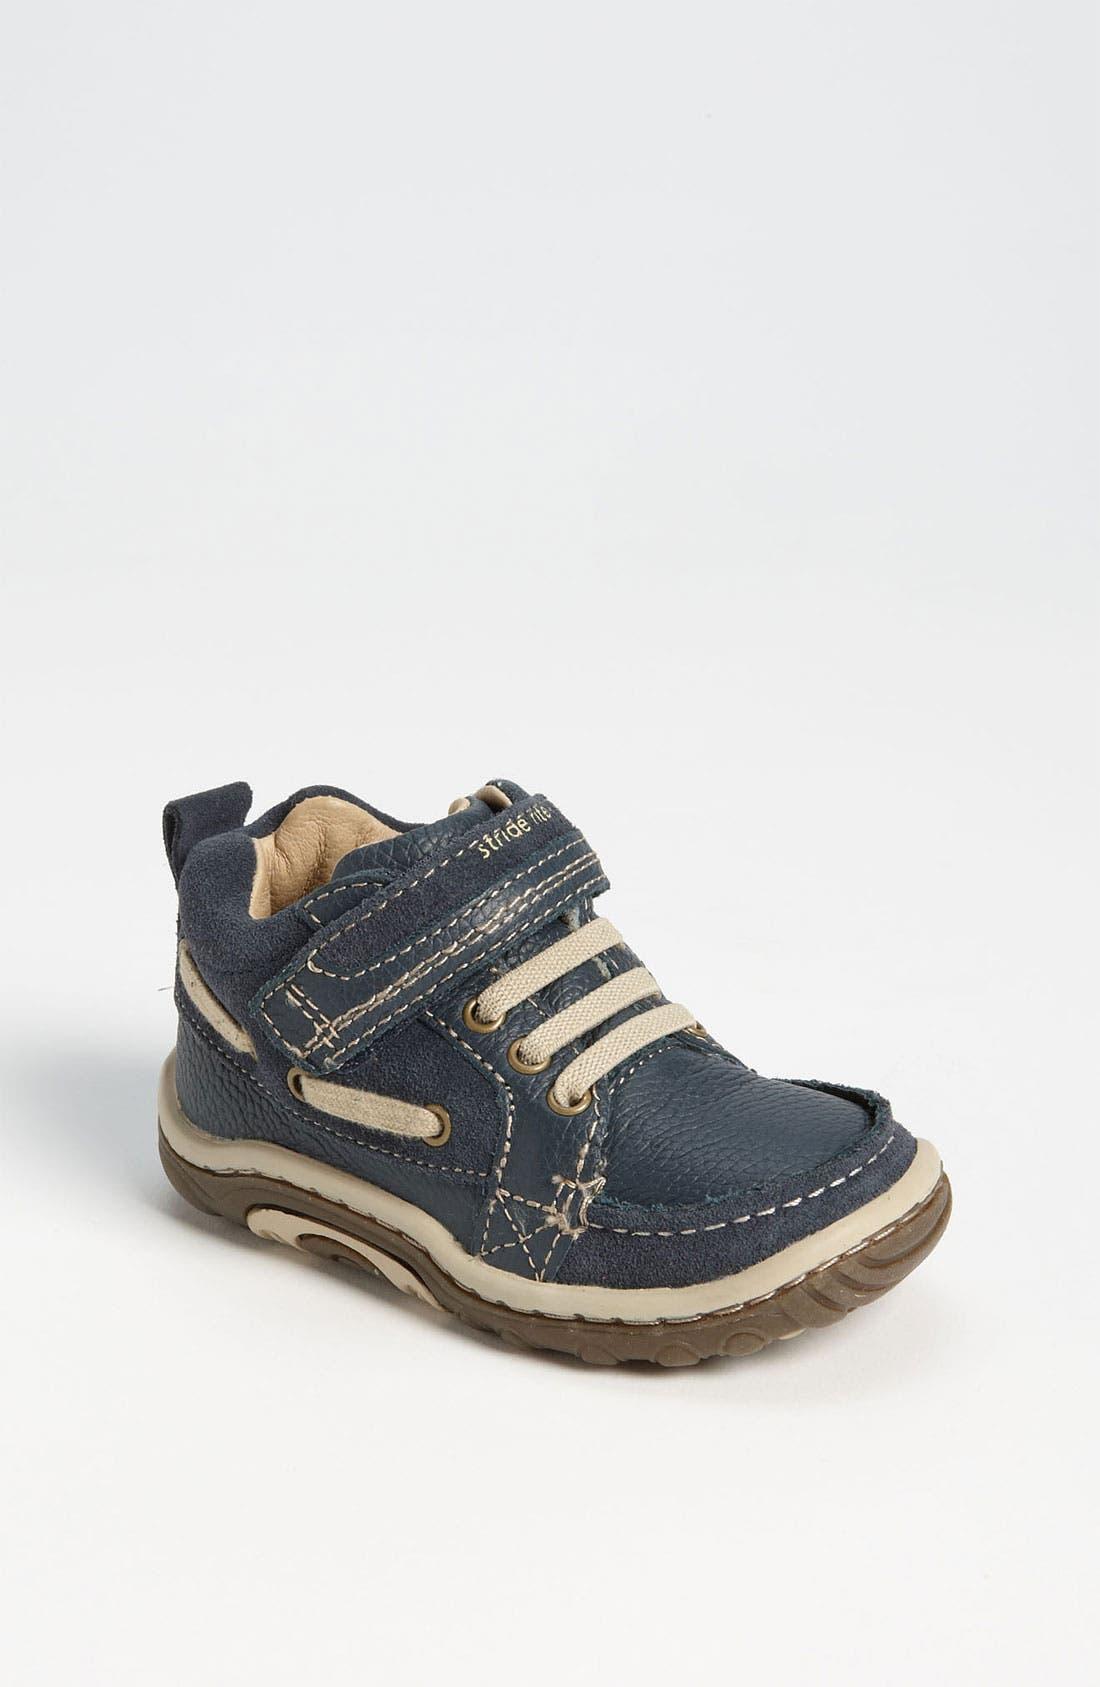 Alternate Image 1 Selected - Stride Rite 'Toby' Sneaker (Baby, Walker & Toddler)